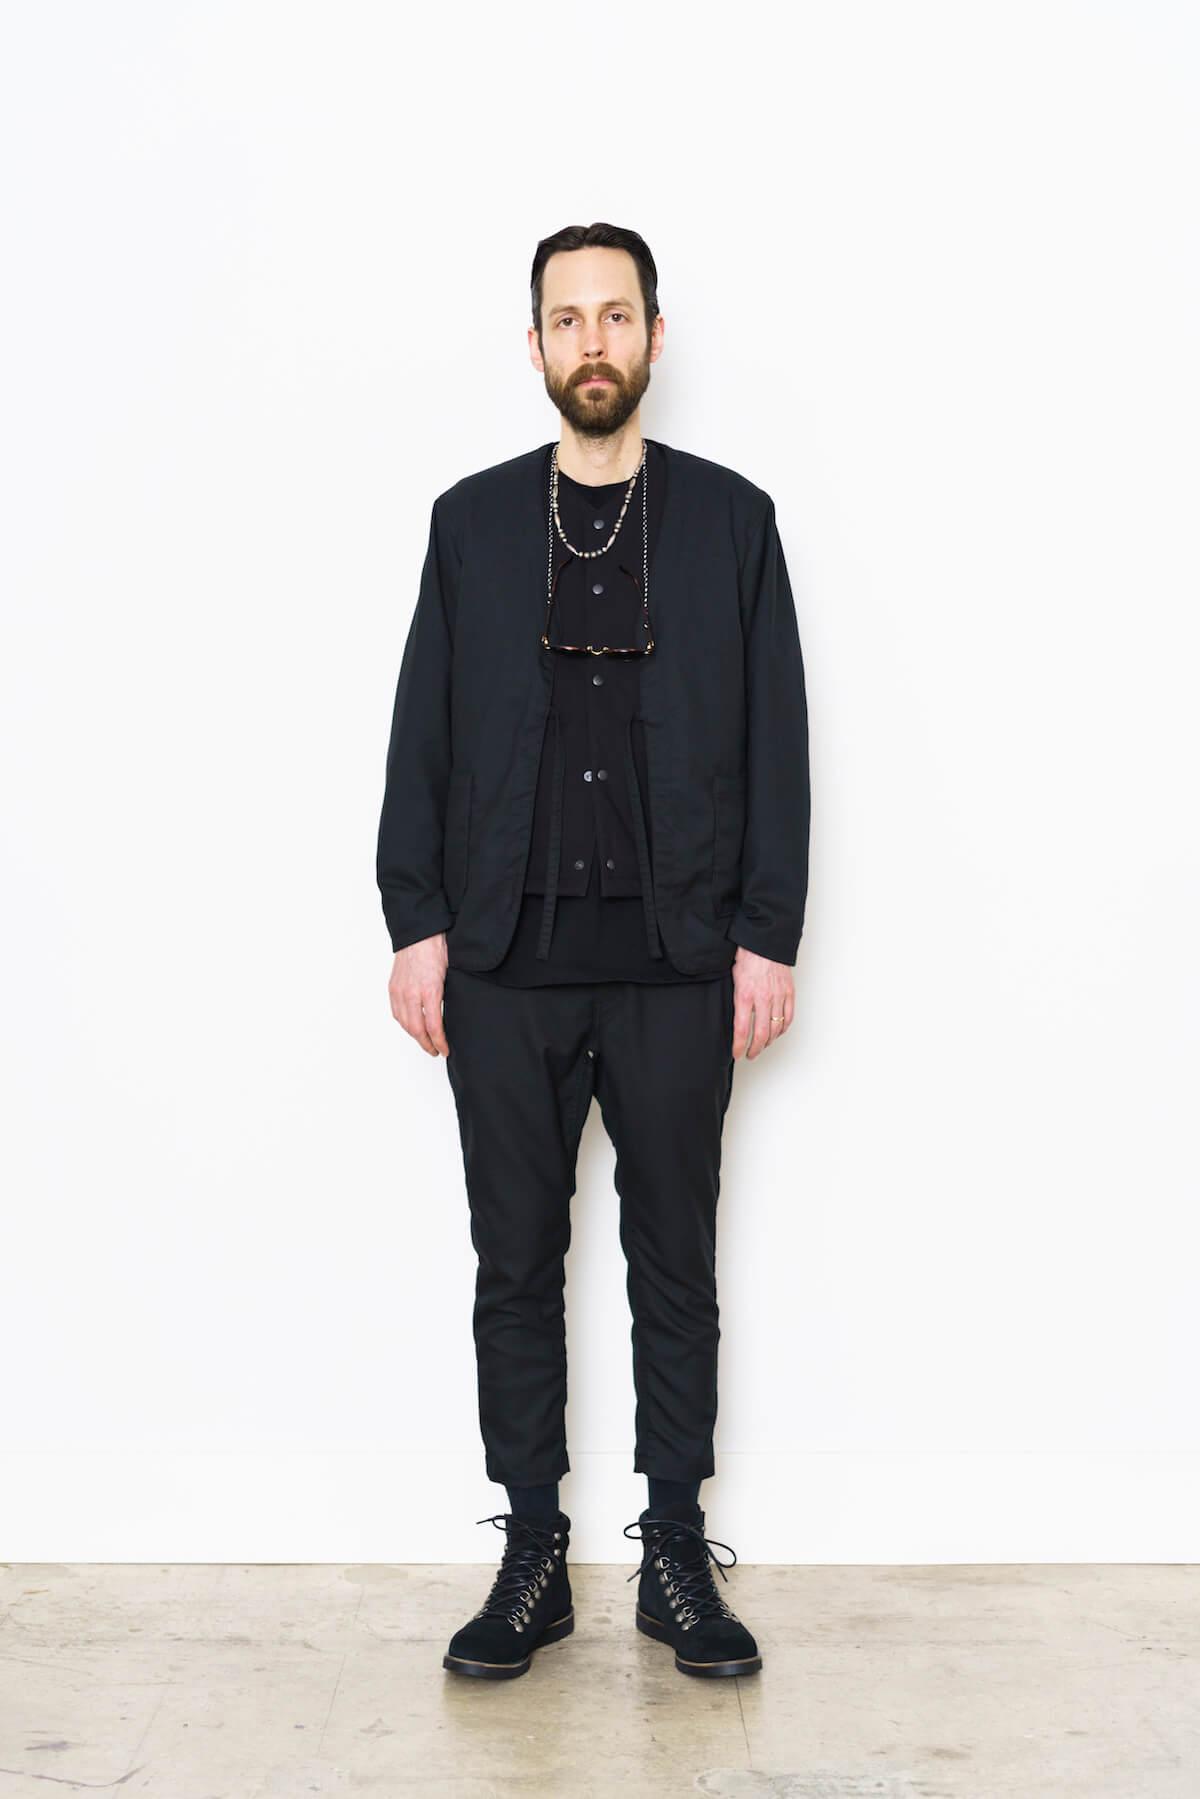 Black(黒/影)×Blank(白/空白)。ブランド「BLANCK」2018AWルックが公開! fashion_blanck_9